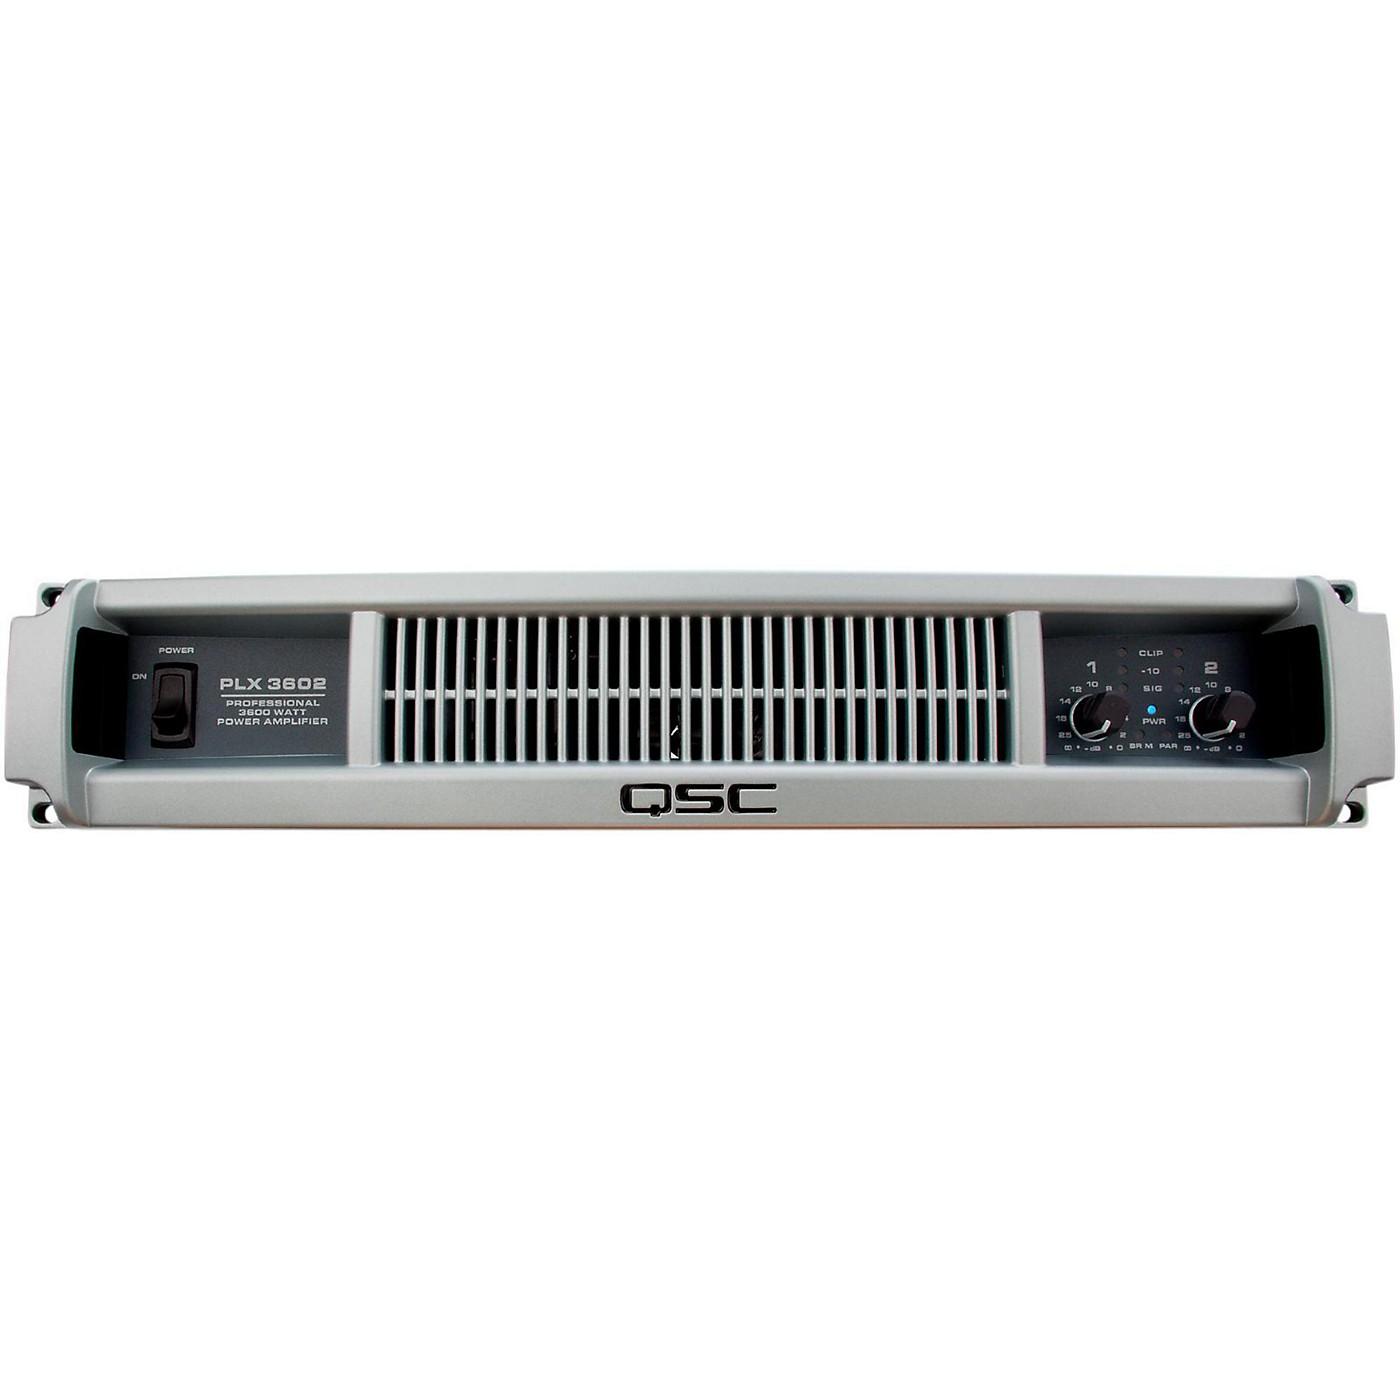 QSC PLX3602 Professional Power Amplifier thumbnail